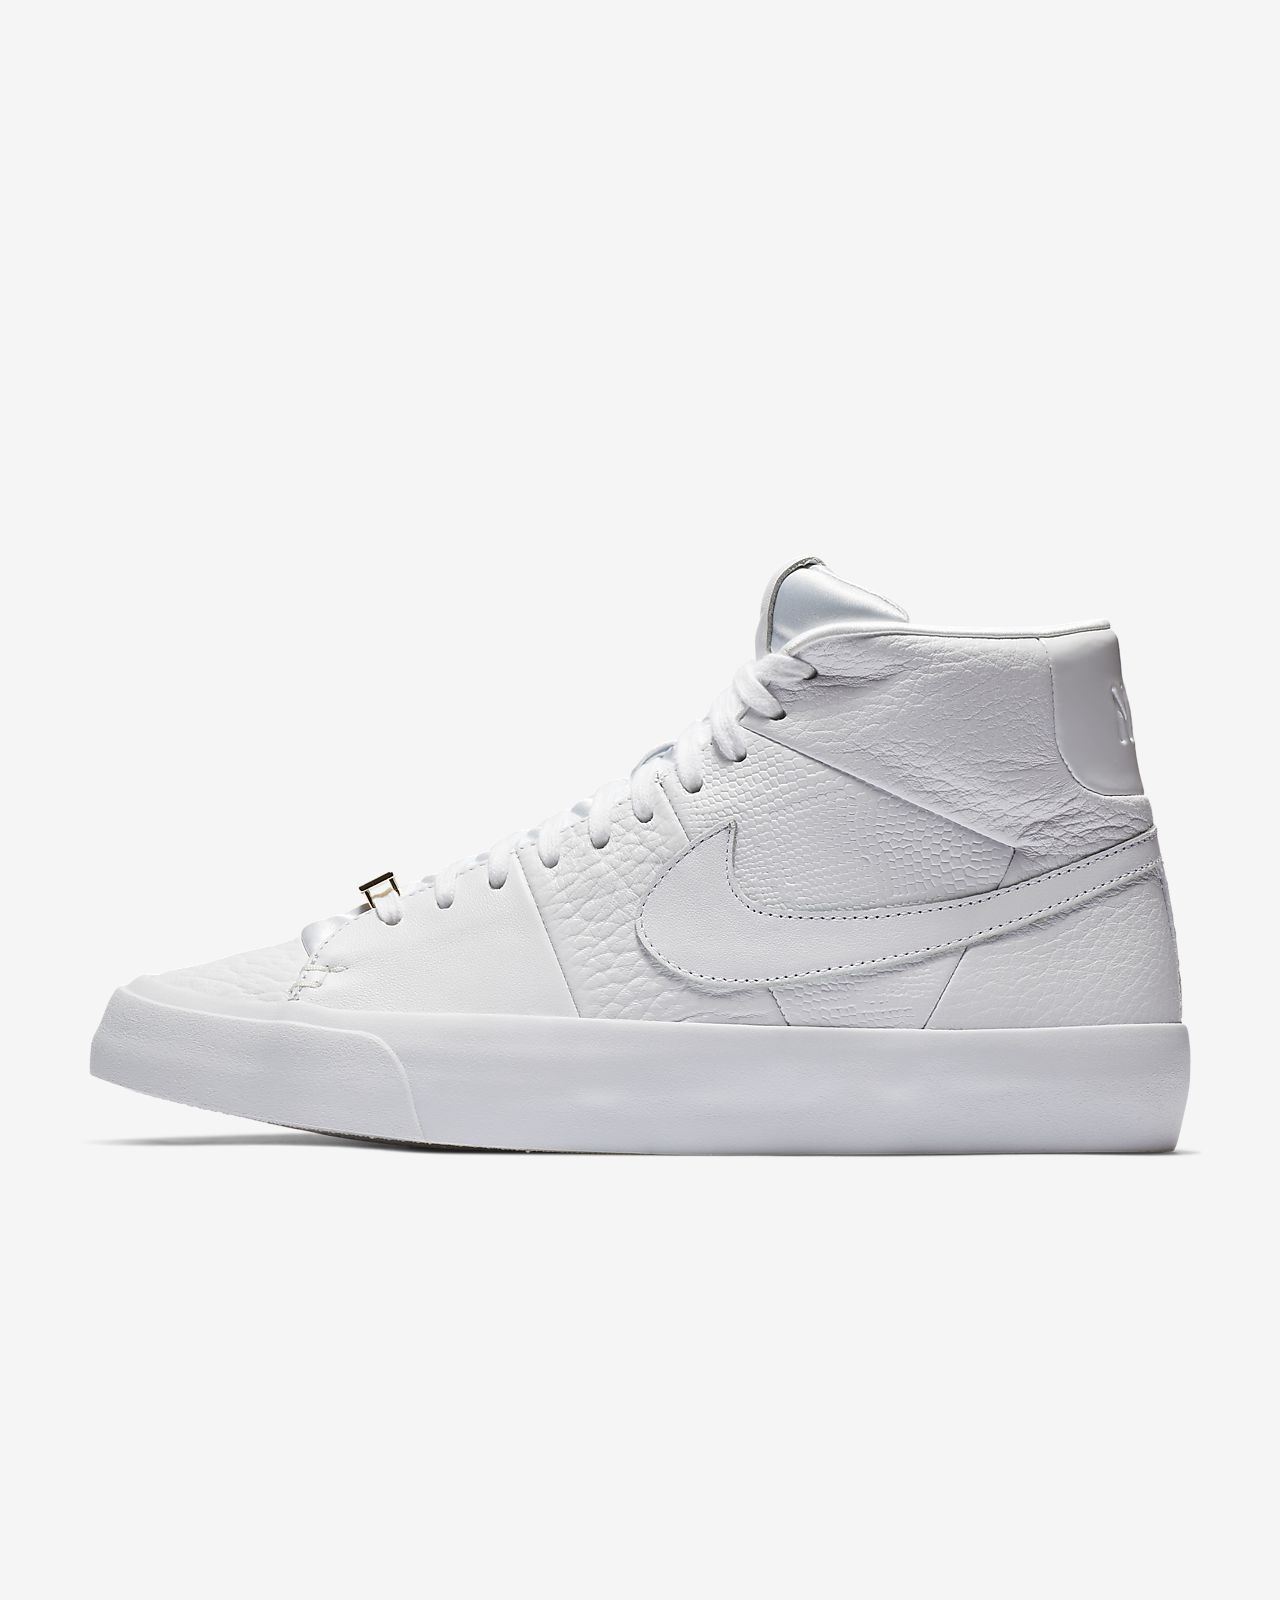 size 40 d4c3f 72b1f Low Resolution Nike Blazer Royal QS Mens Shoe Nike Blazer Royal QS Mens  Shoe